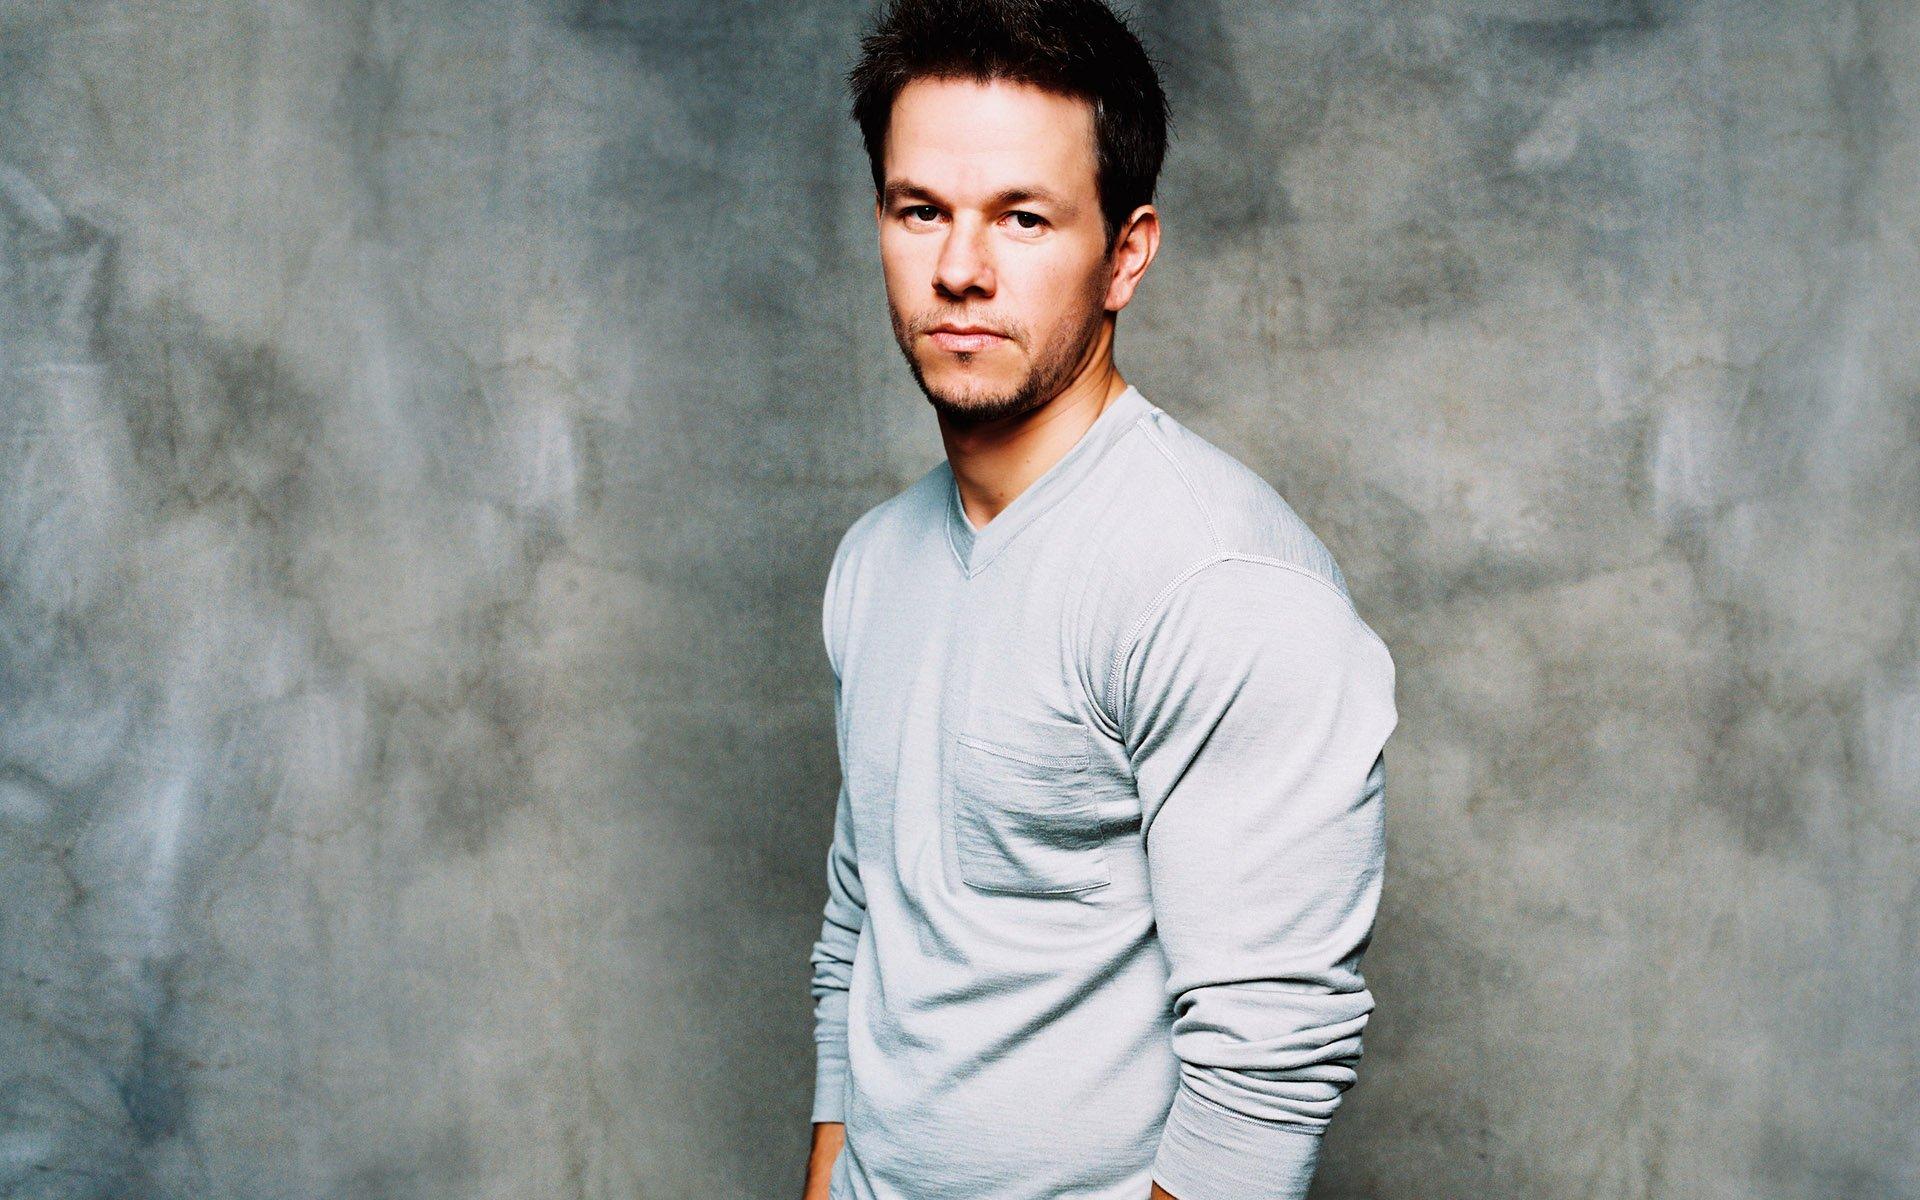 Mark Wahlberg HD Wallpaper Background Image 1920x1200 ID 1920x1200